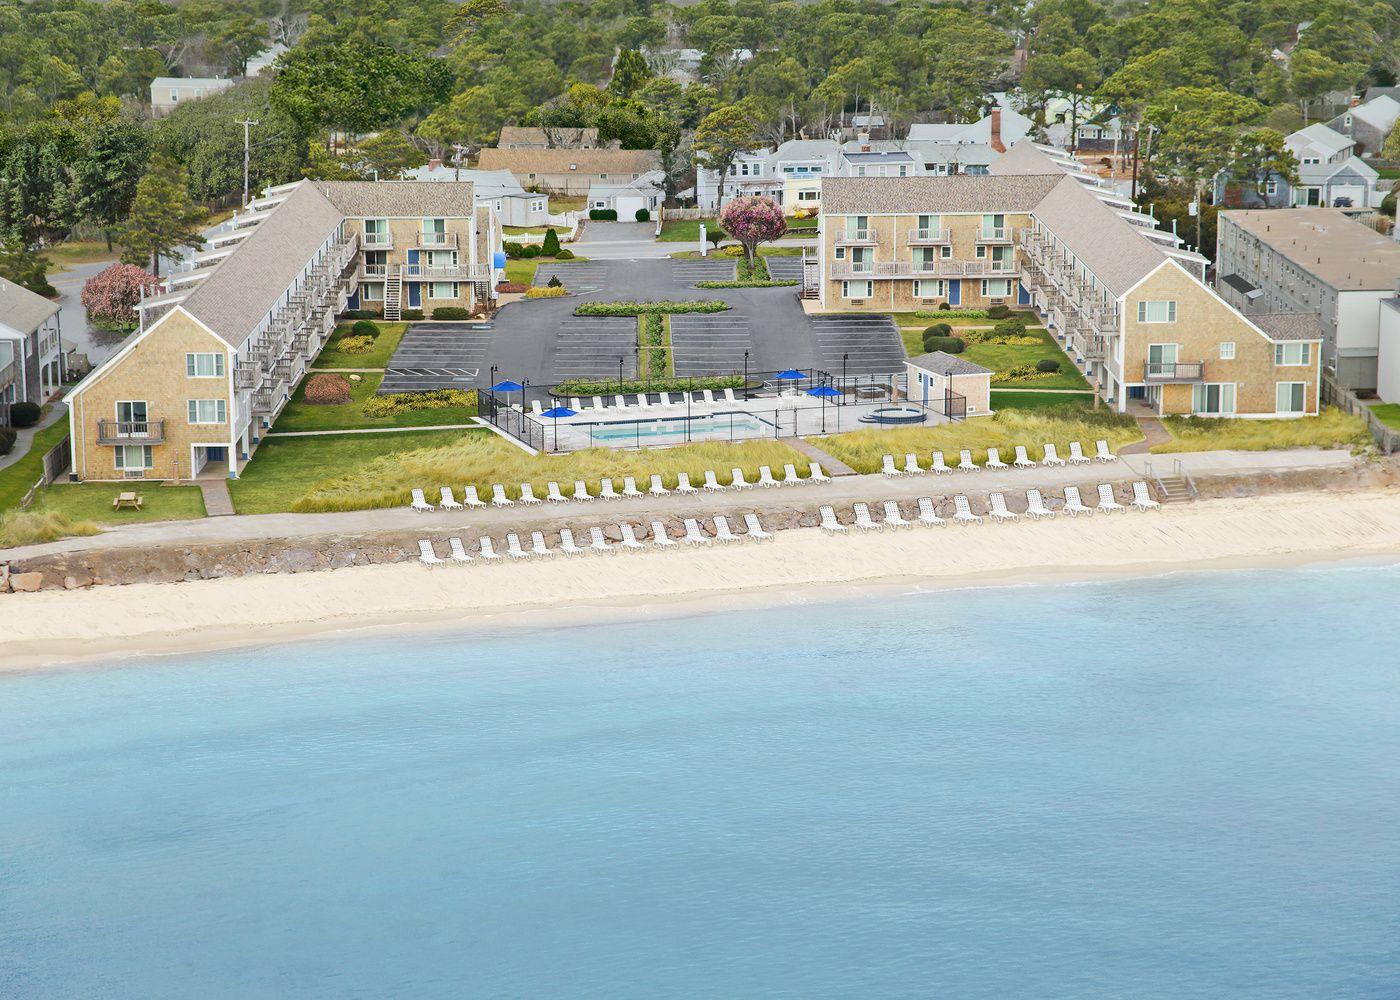 Cape Cod Beach Hotels Ocean Mist Hotel Cape Cod Ma Beach Hotels Cape Cod Beaches South Yarmouth